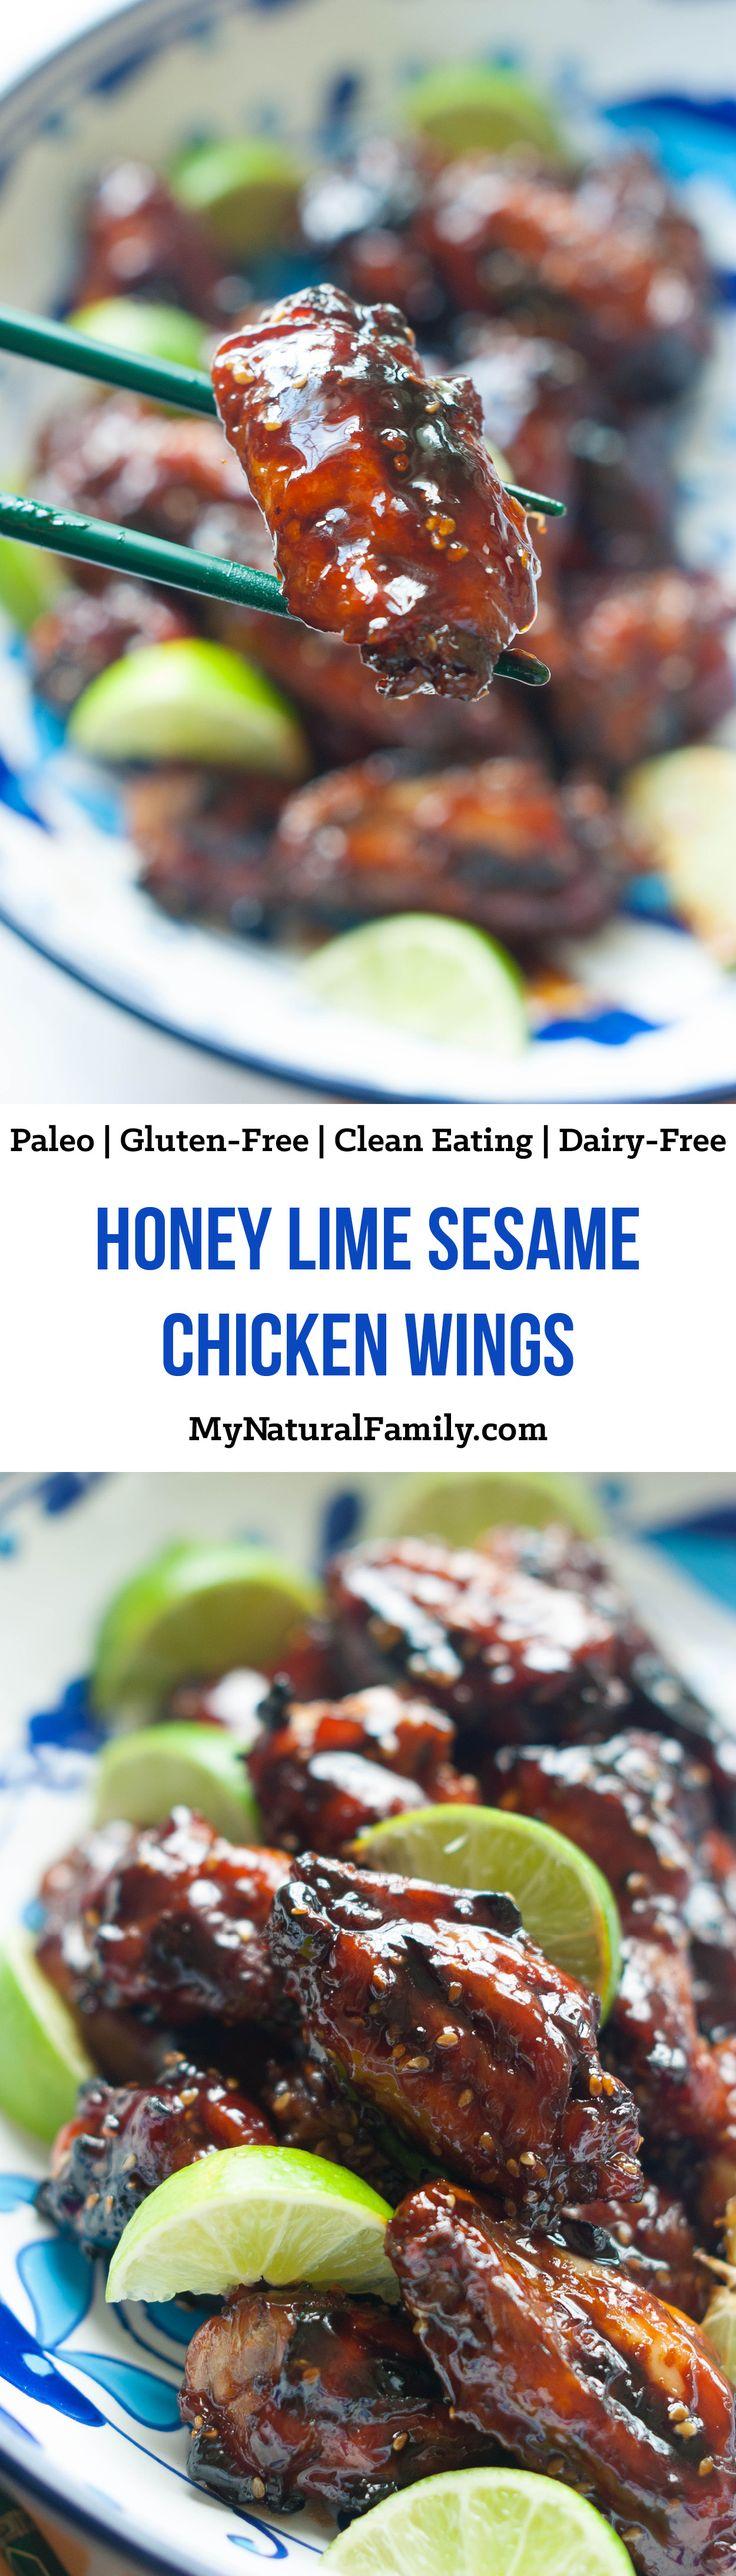 Honey Lime Sesame Paleo Chicken Wings Recipe